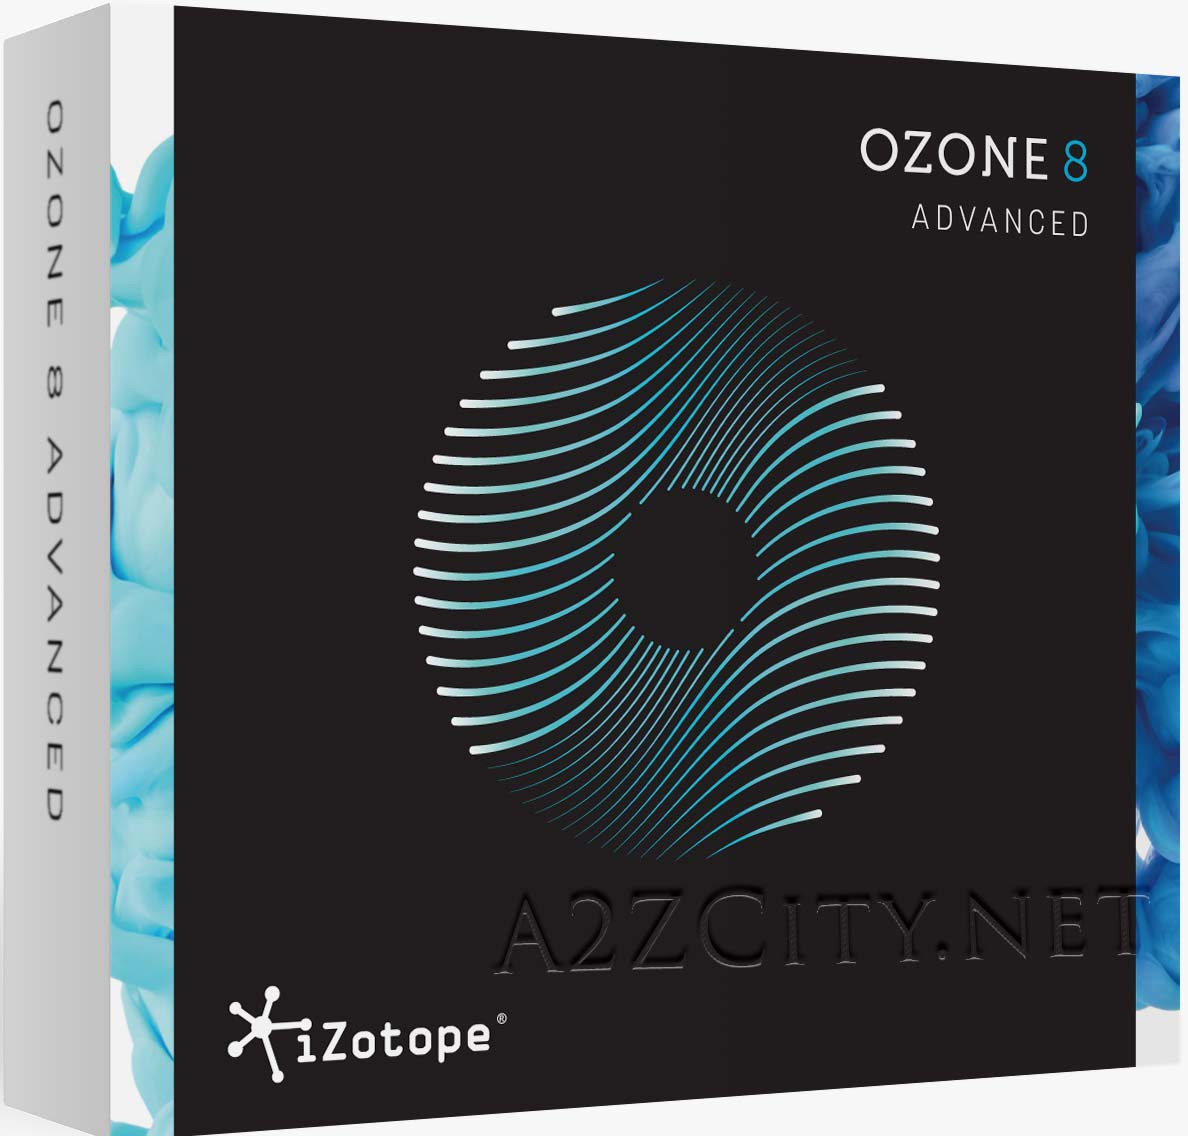 izotope ozone 8 crack download